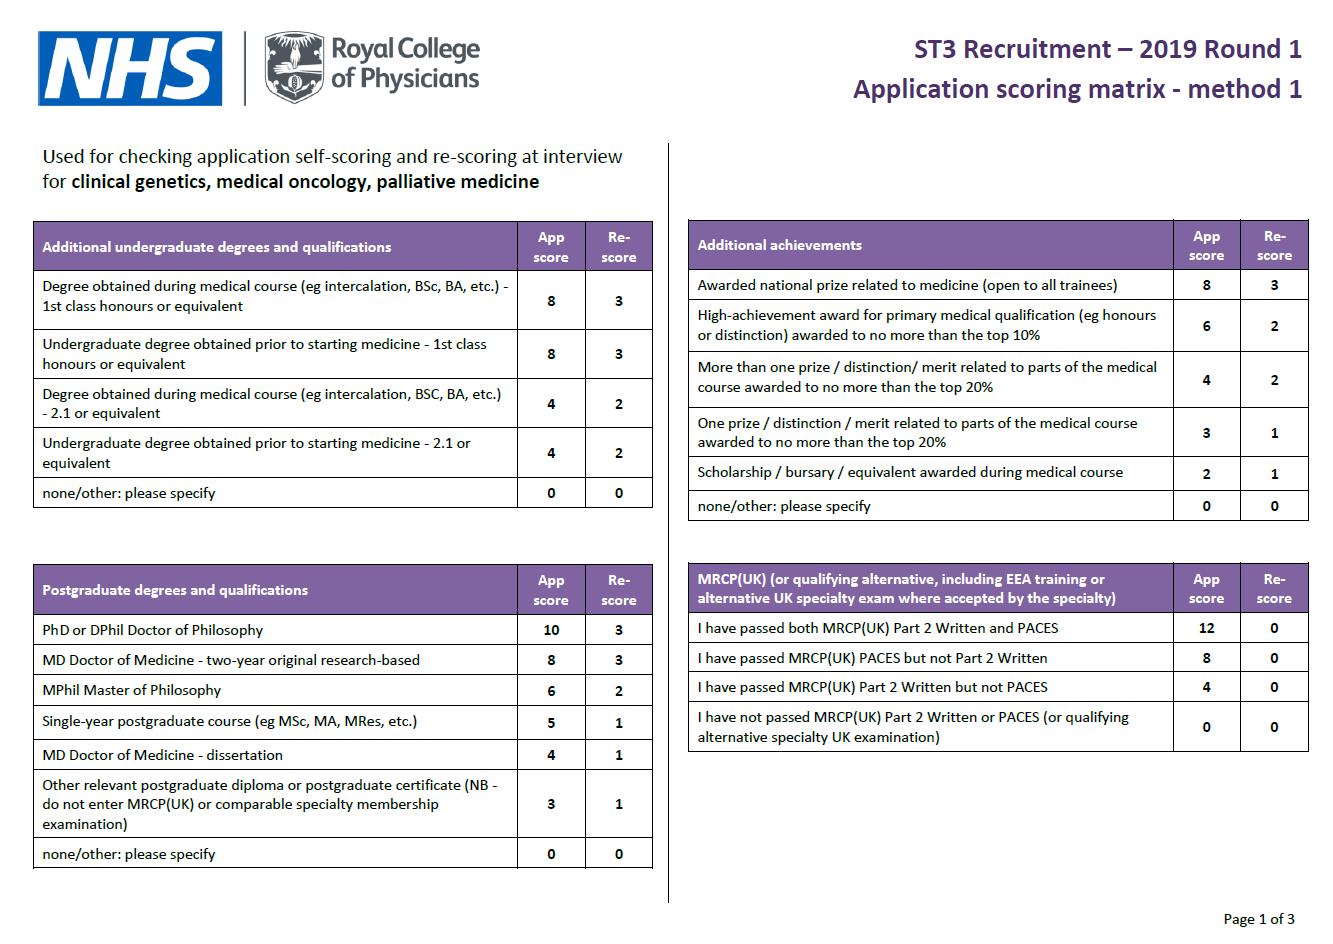 Clinical genetics | ST3 Recruitment - Full, comprehensive guidance